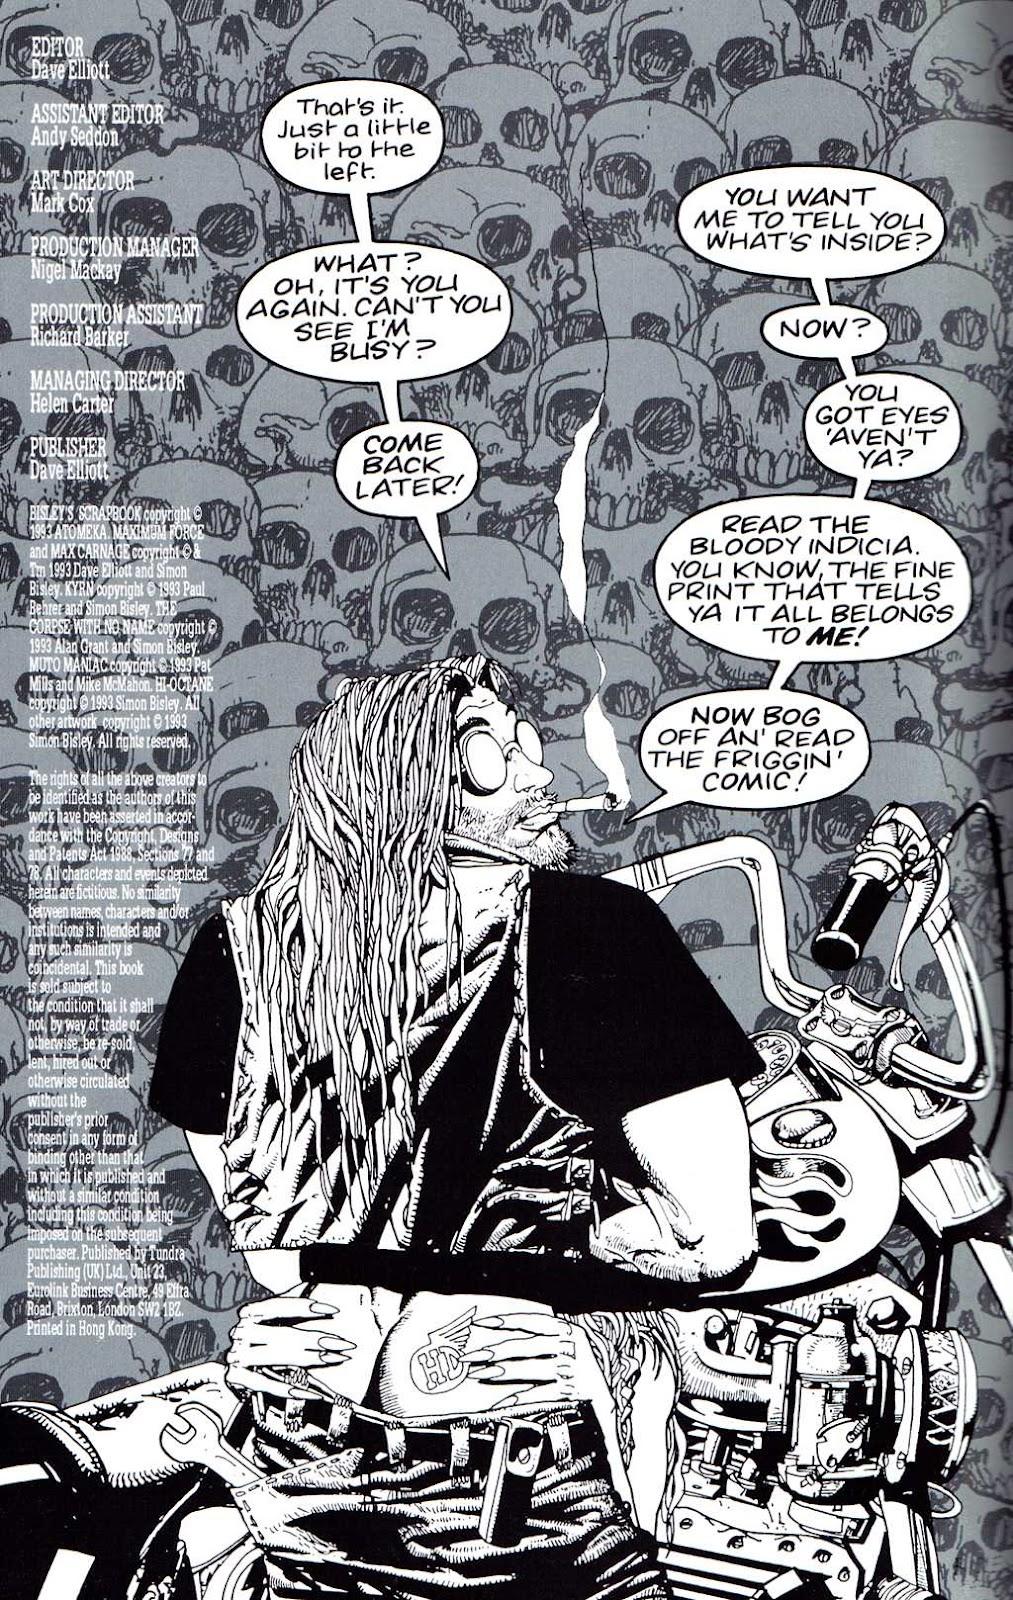 Read online Bisley's Scrapbook comic -  Issue # Full - 2